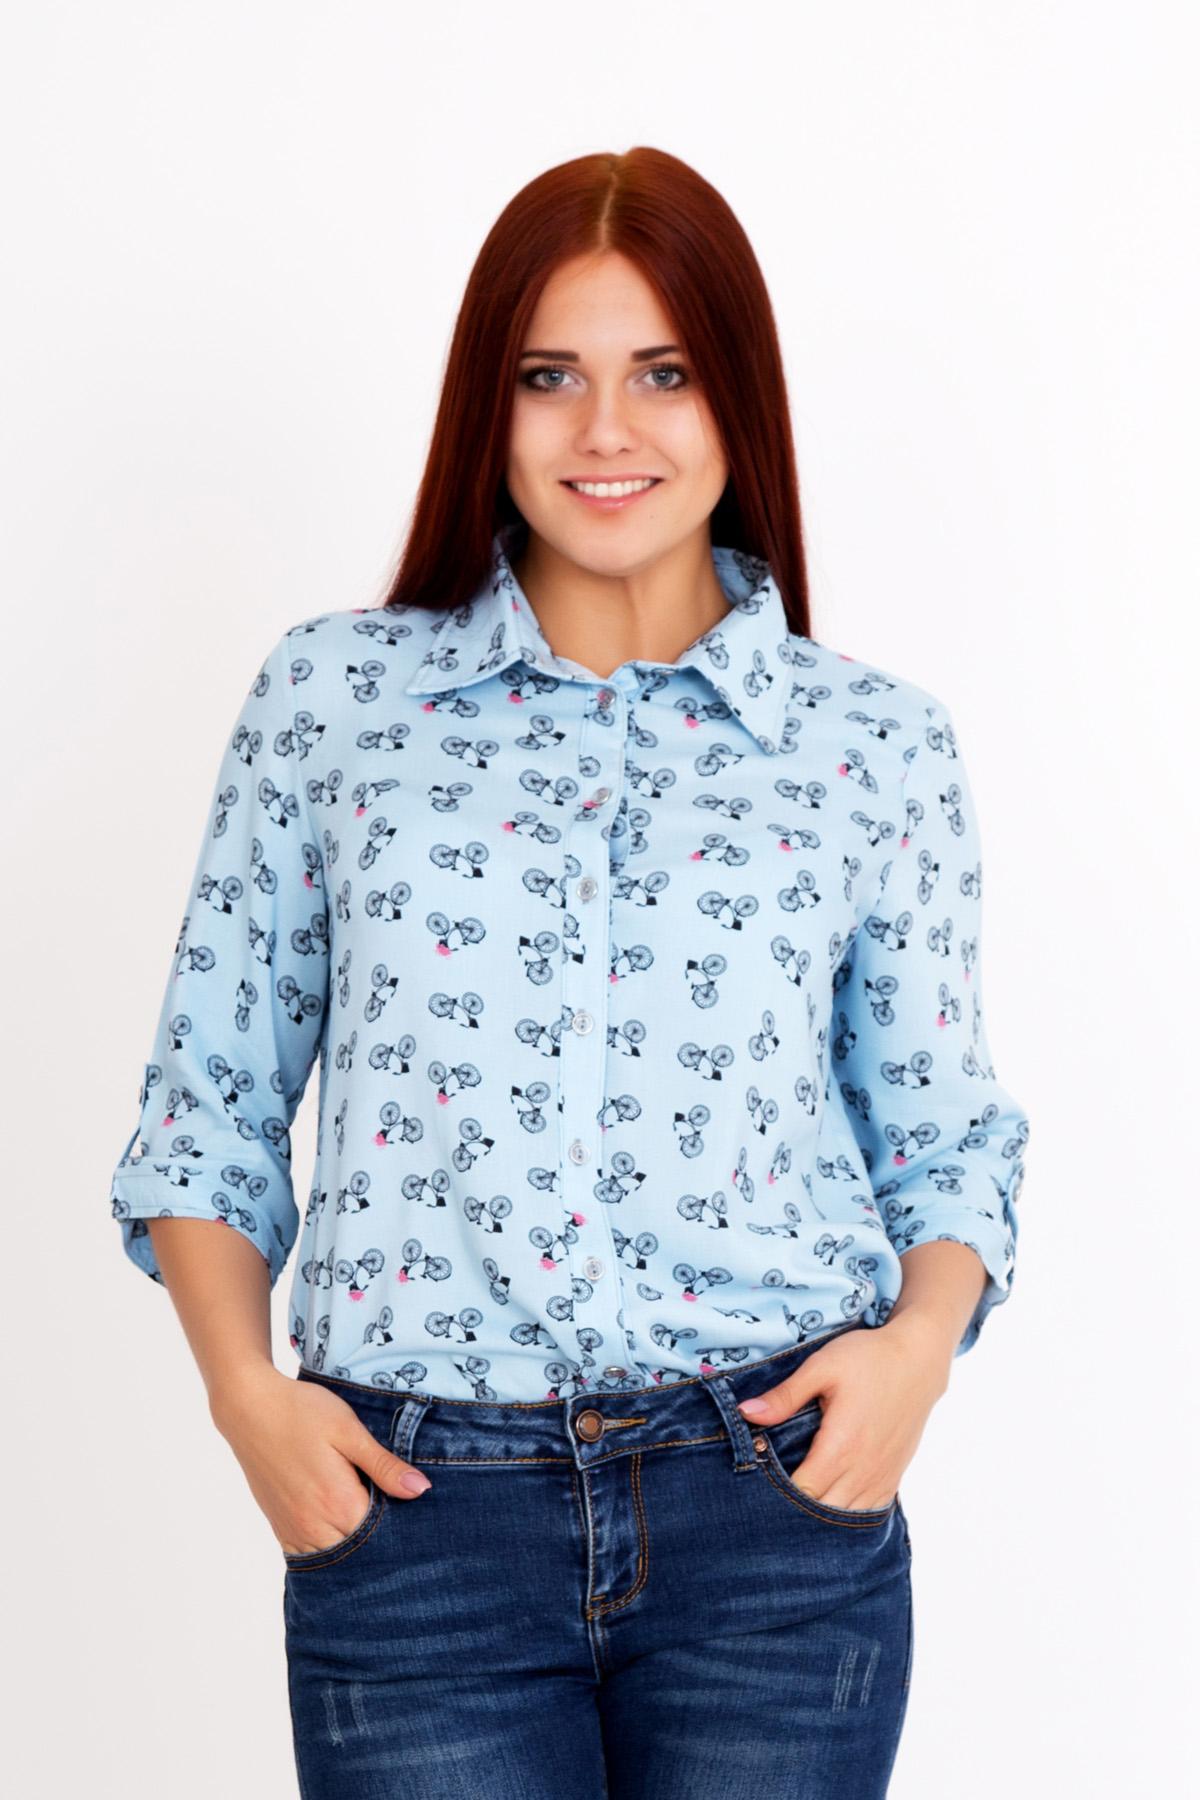 Жен. рубашка  Виола  р. 44 - Женская одежда артикул: 19535